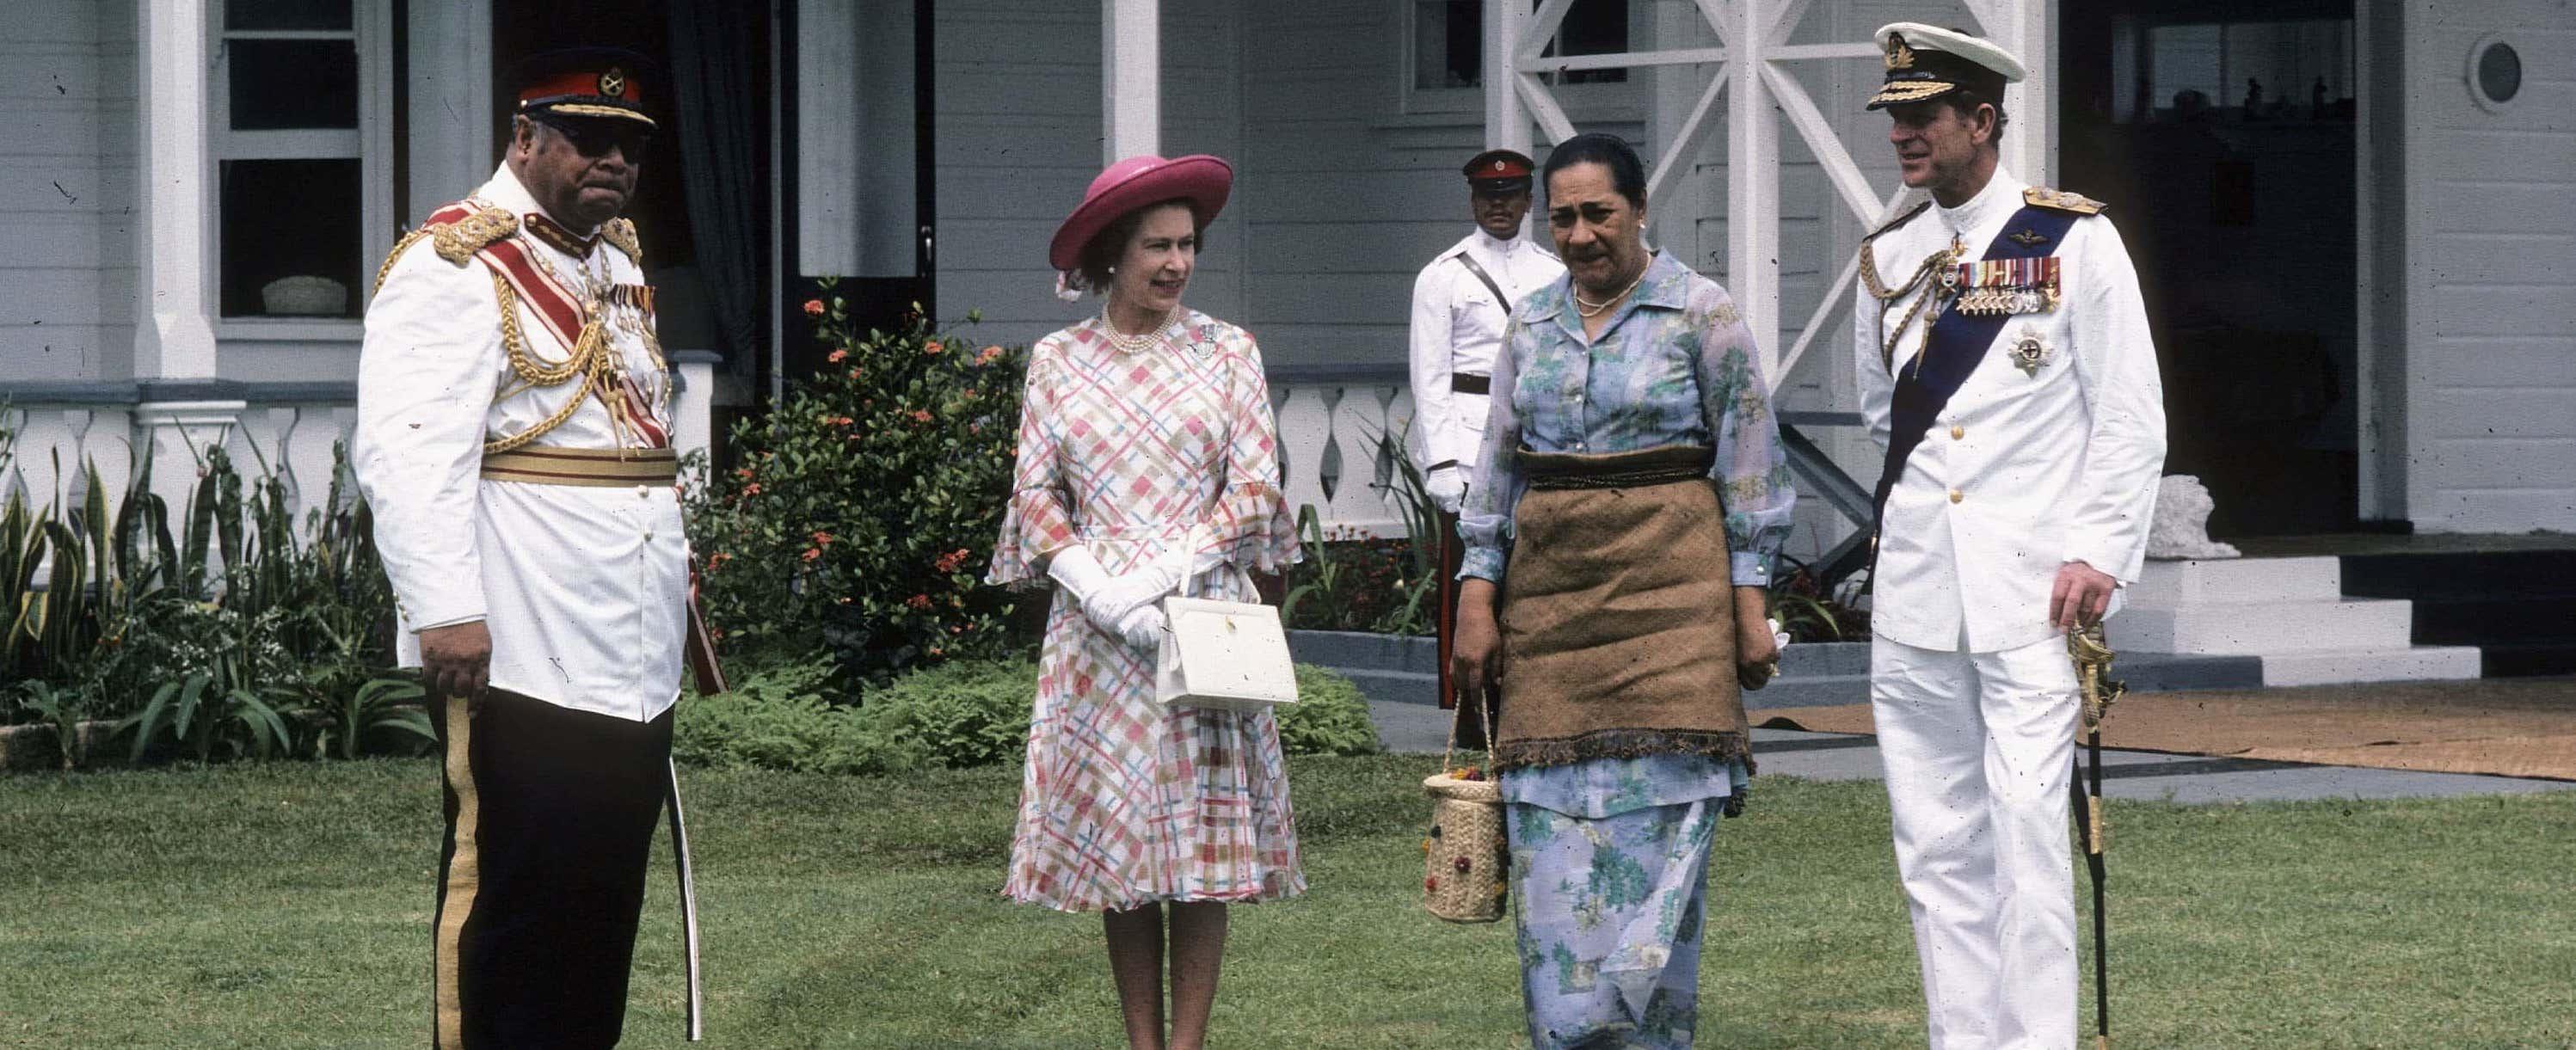 Tongan King Taufa'ahau Tupou lV and Queen Halaevalu Mataʻaho Ahomeʻe meet Queen Elizabeth ll and Prince Philip, Tonga, 1977. (Photo: Anwar Hussein Collection/Getty)